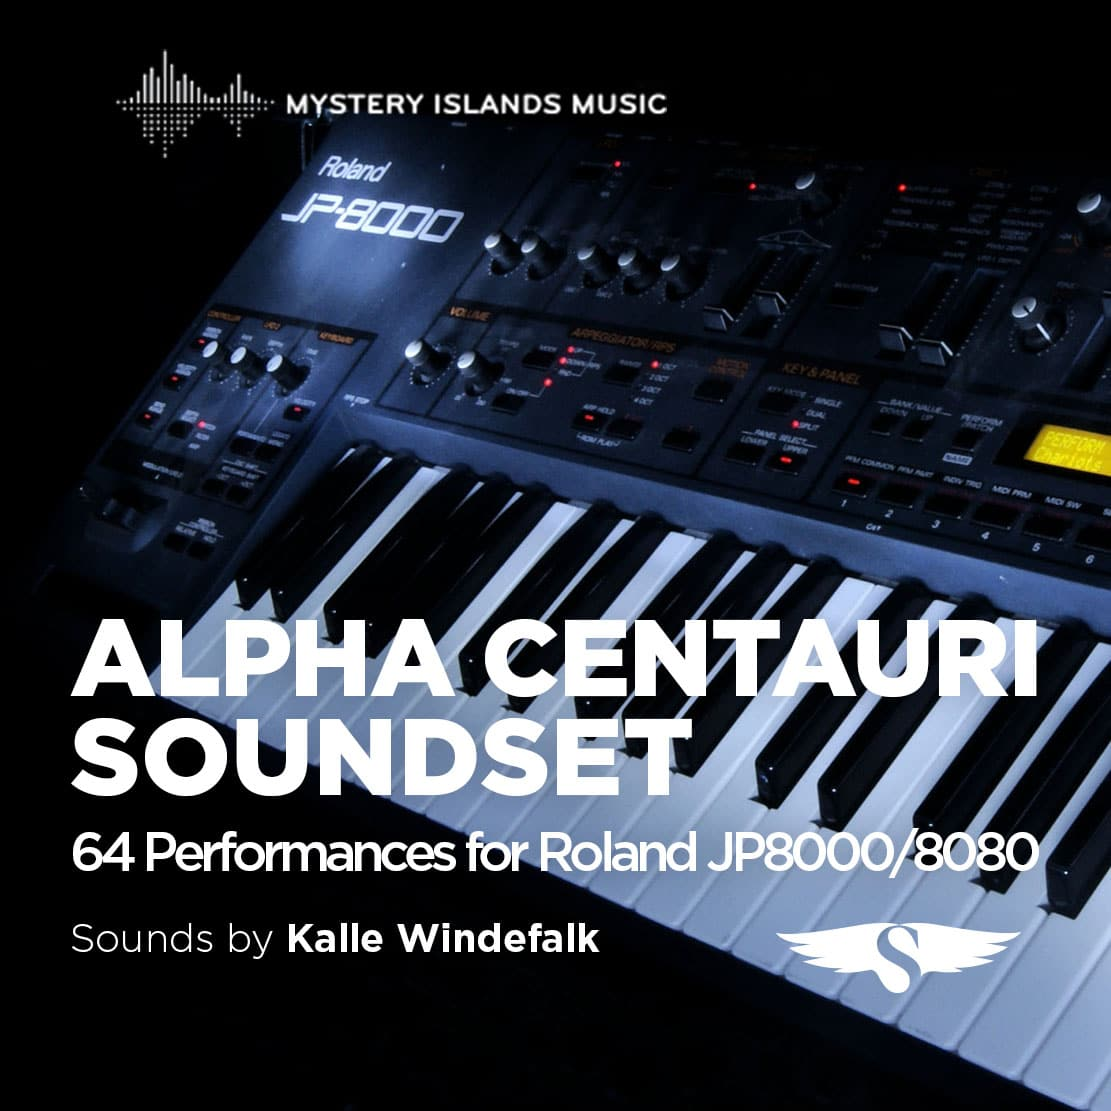 Roland JP-80x0 Alpha Centauri Soundset